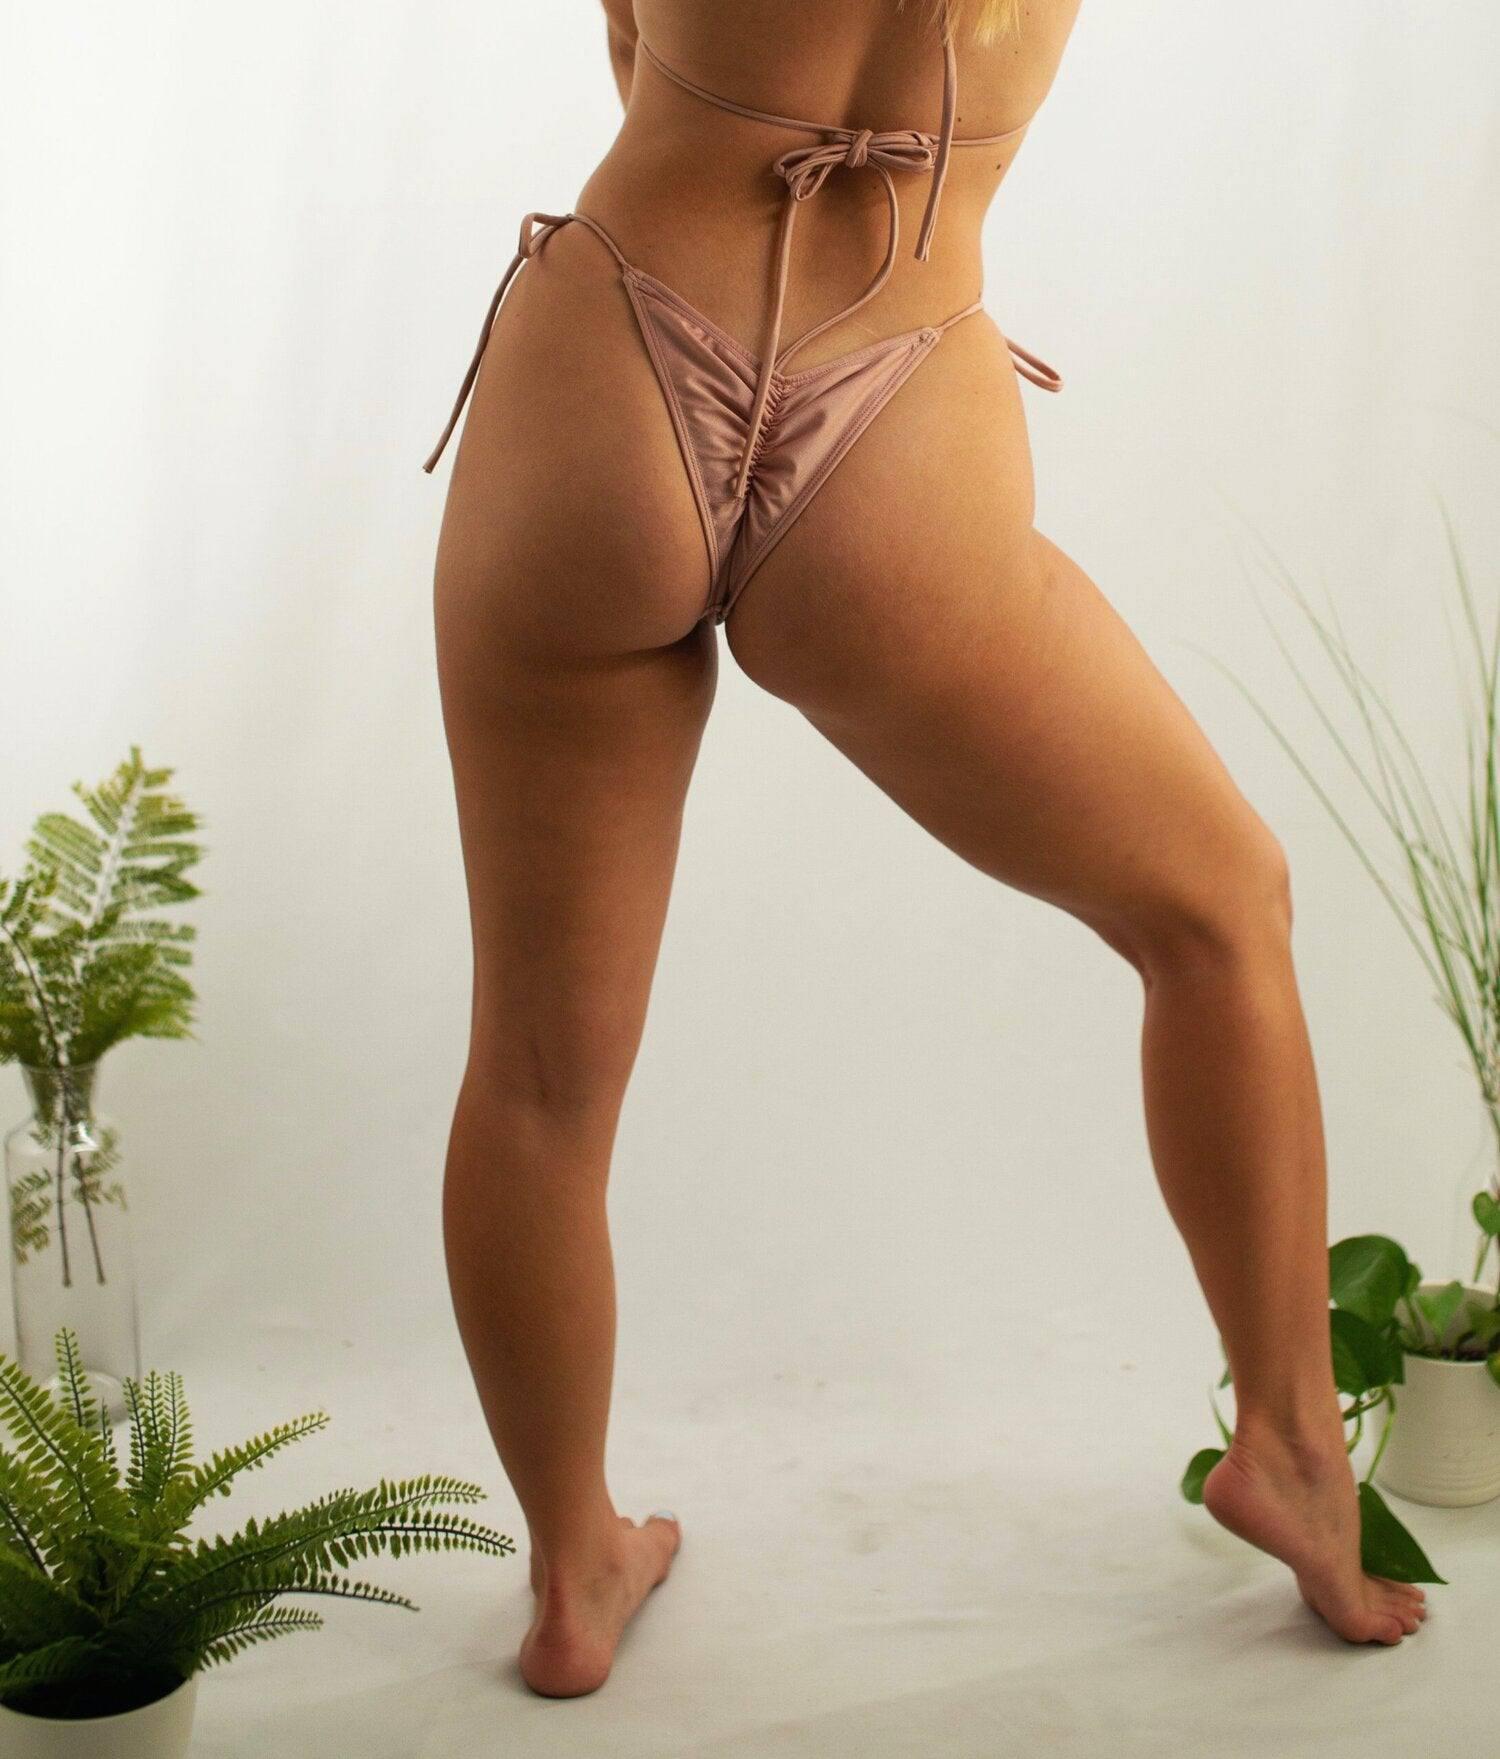 Lexee Smith In Tiny Bikini